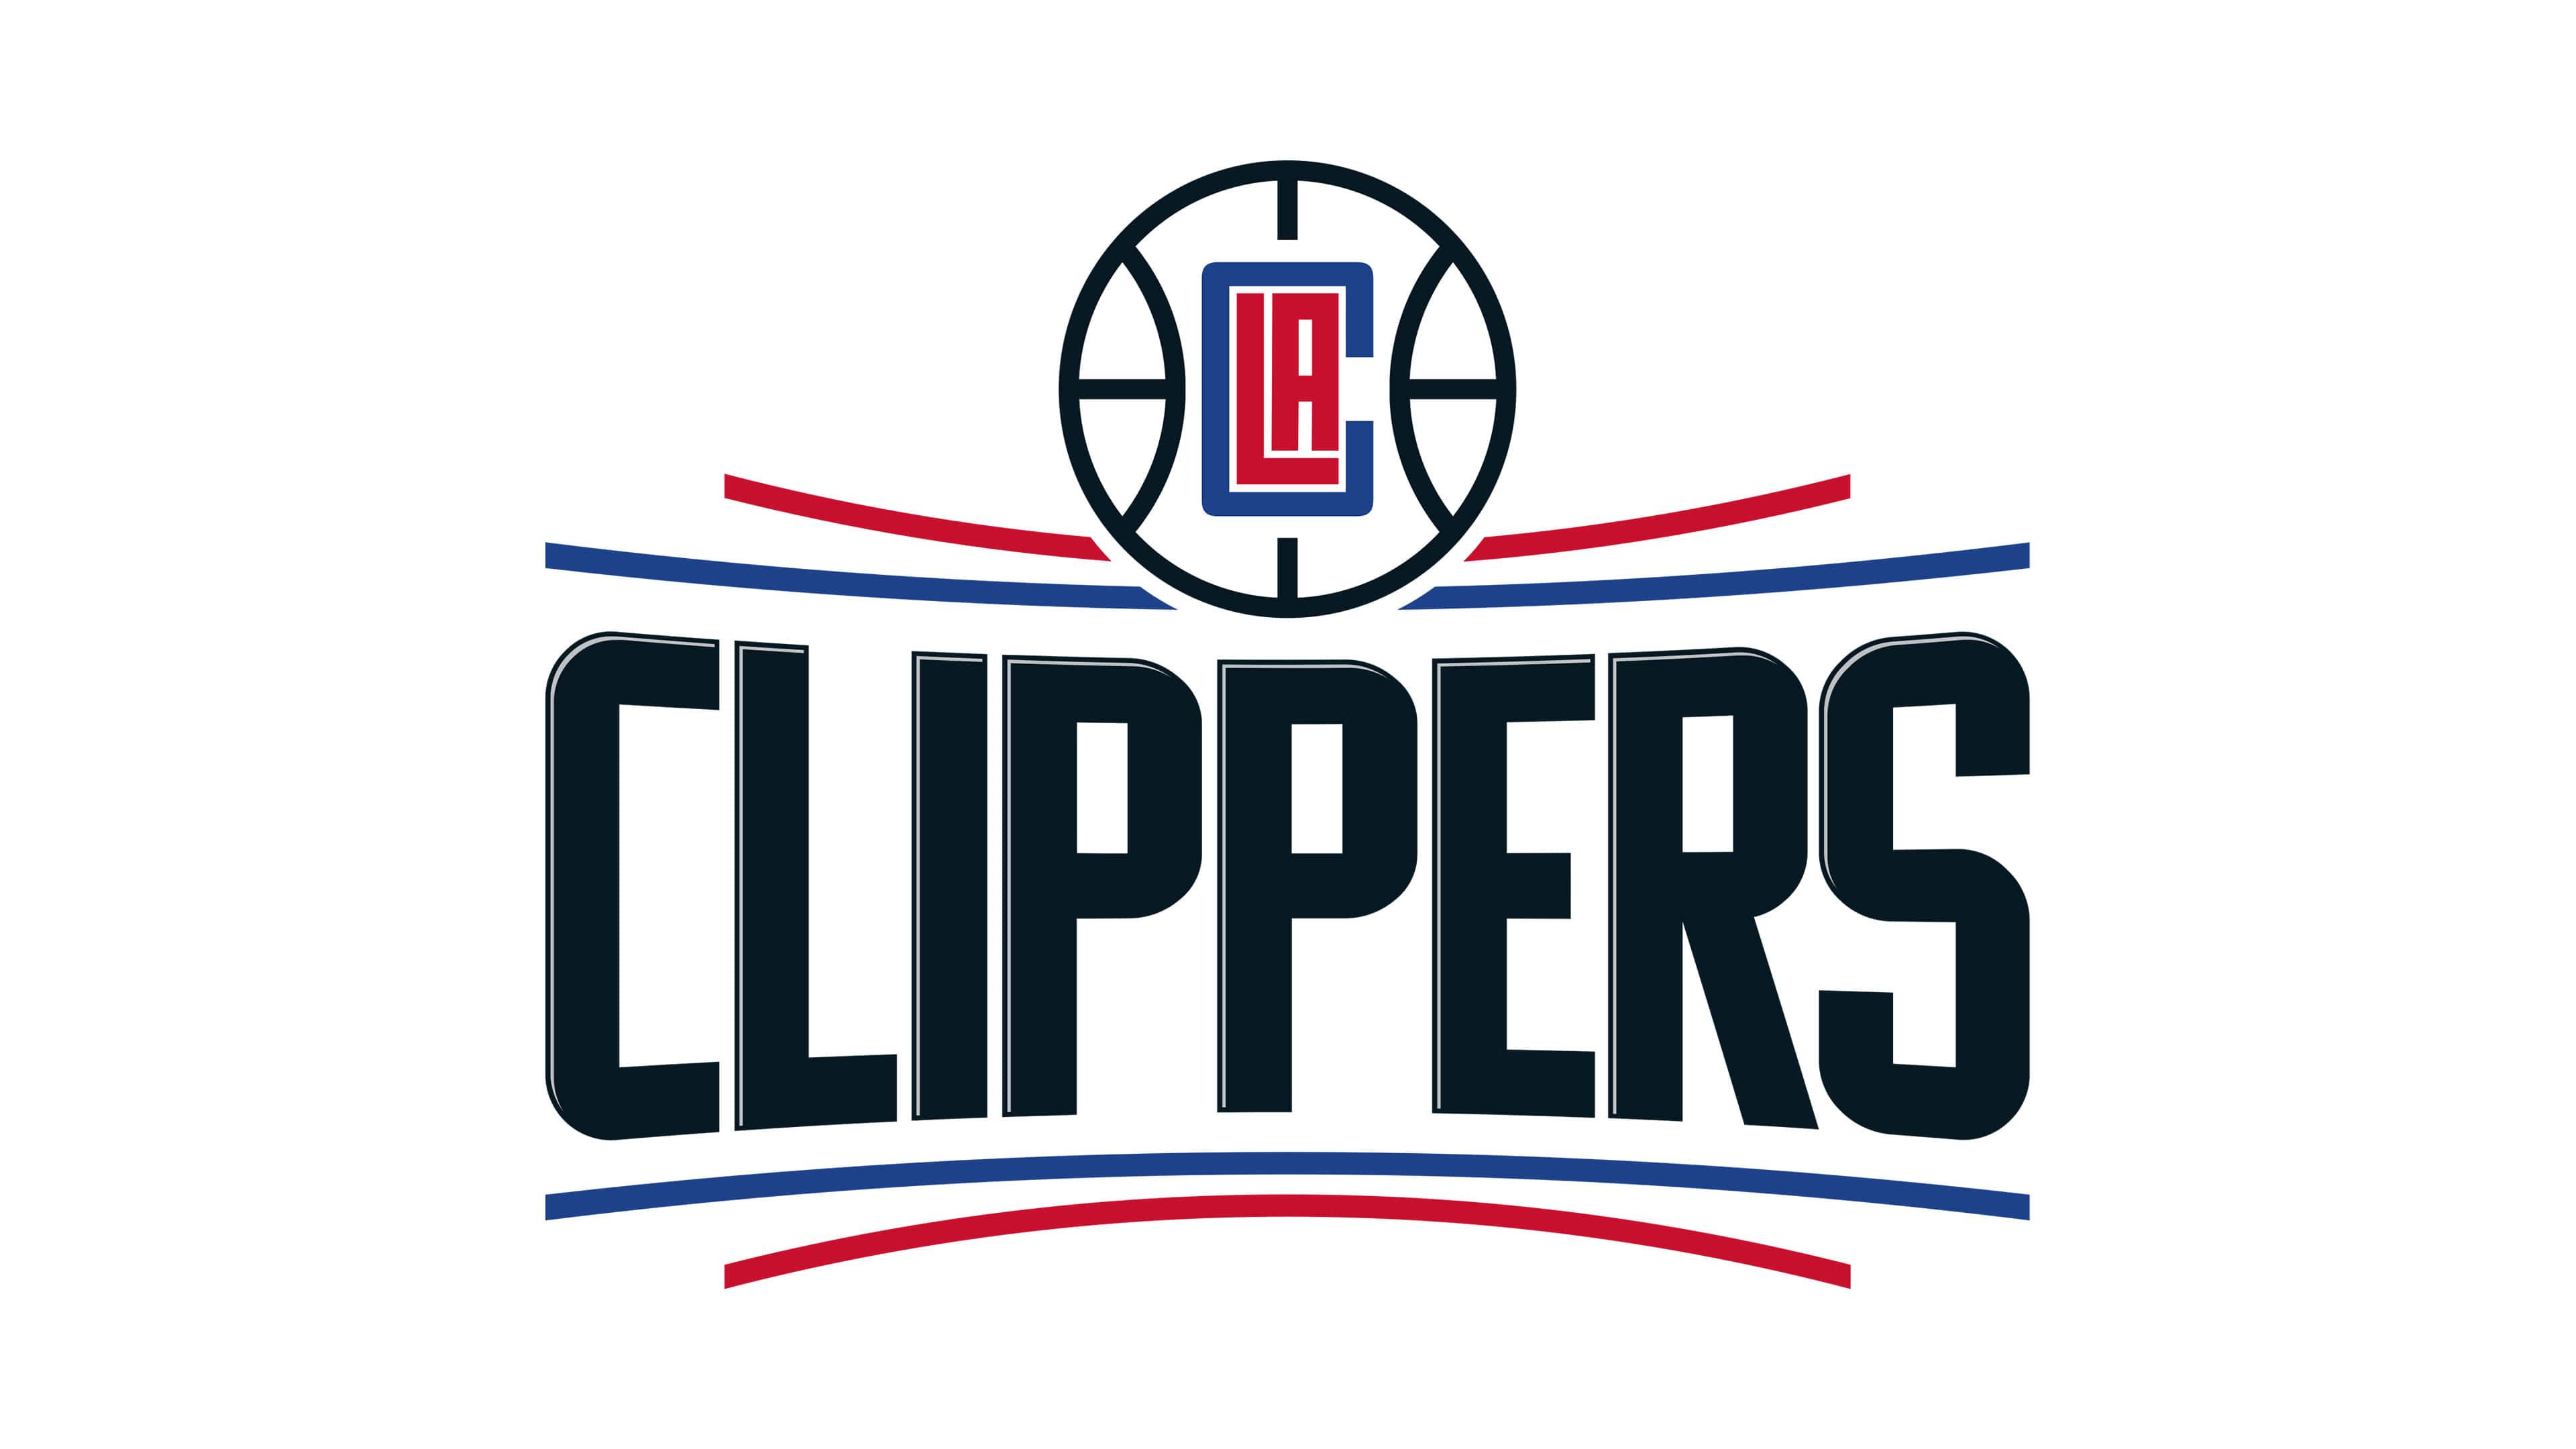 los angeles clippers nba logo uhd 4k wallpaper